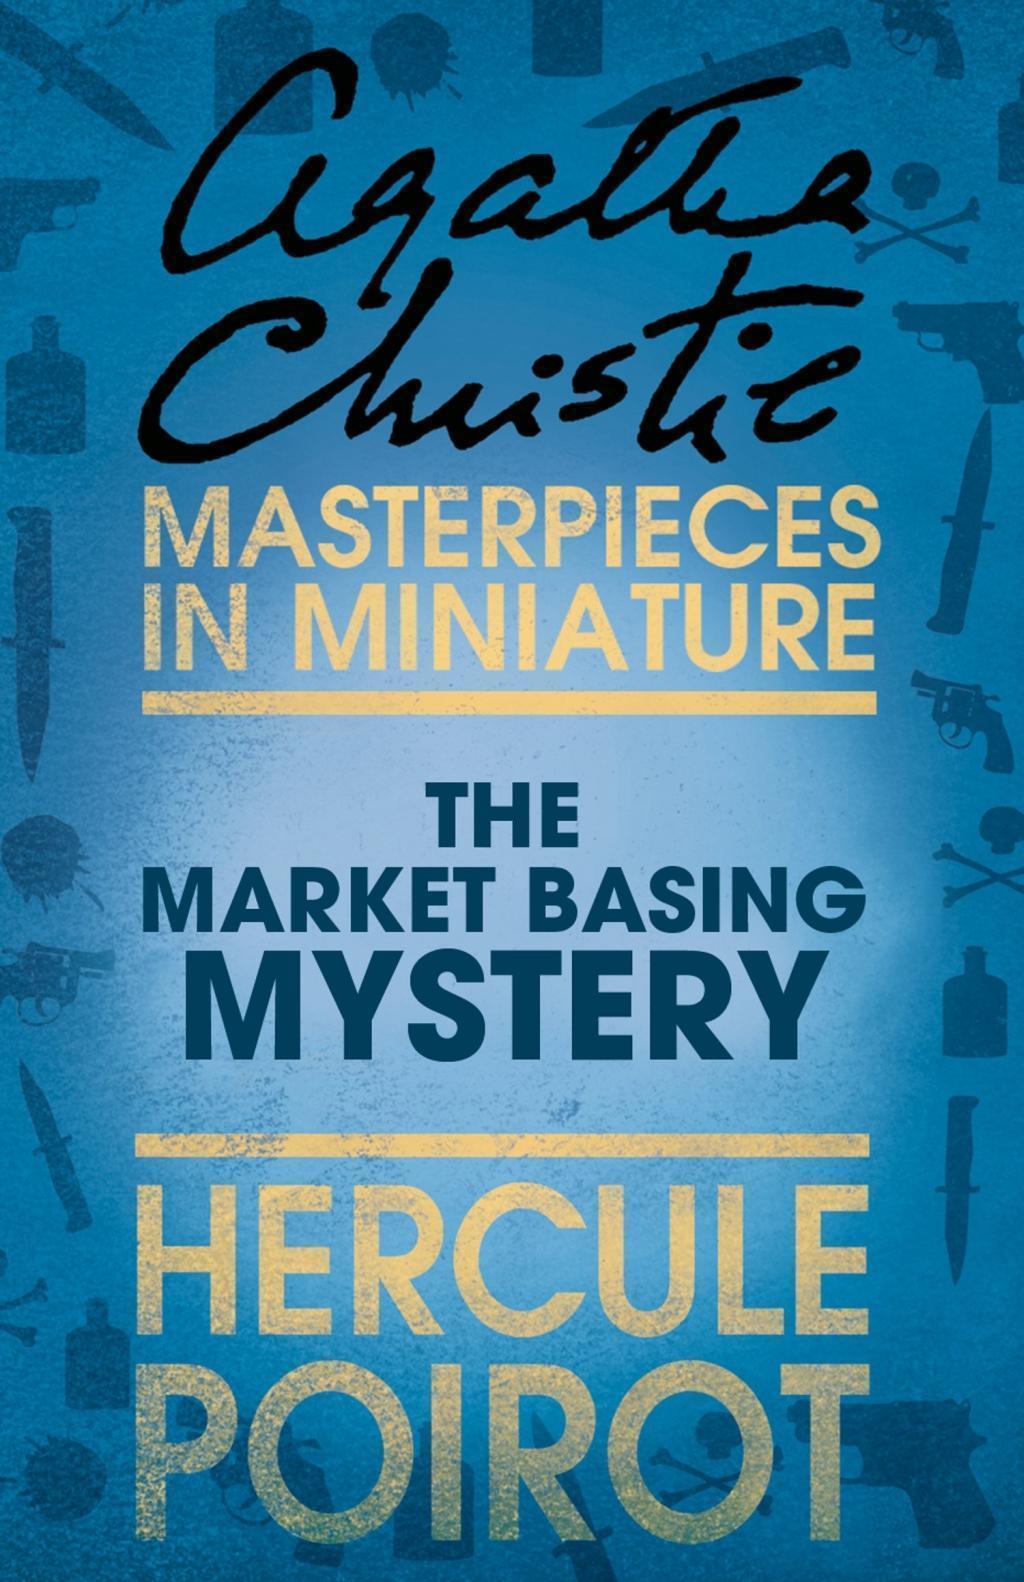 The Market Basing Mystery: A Hercule Poirot Short Story